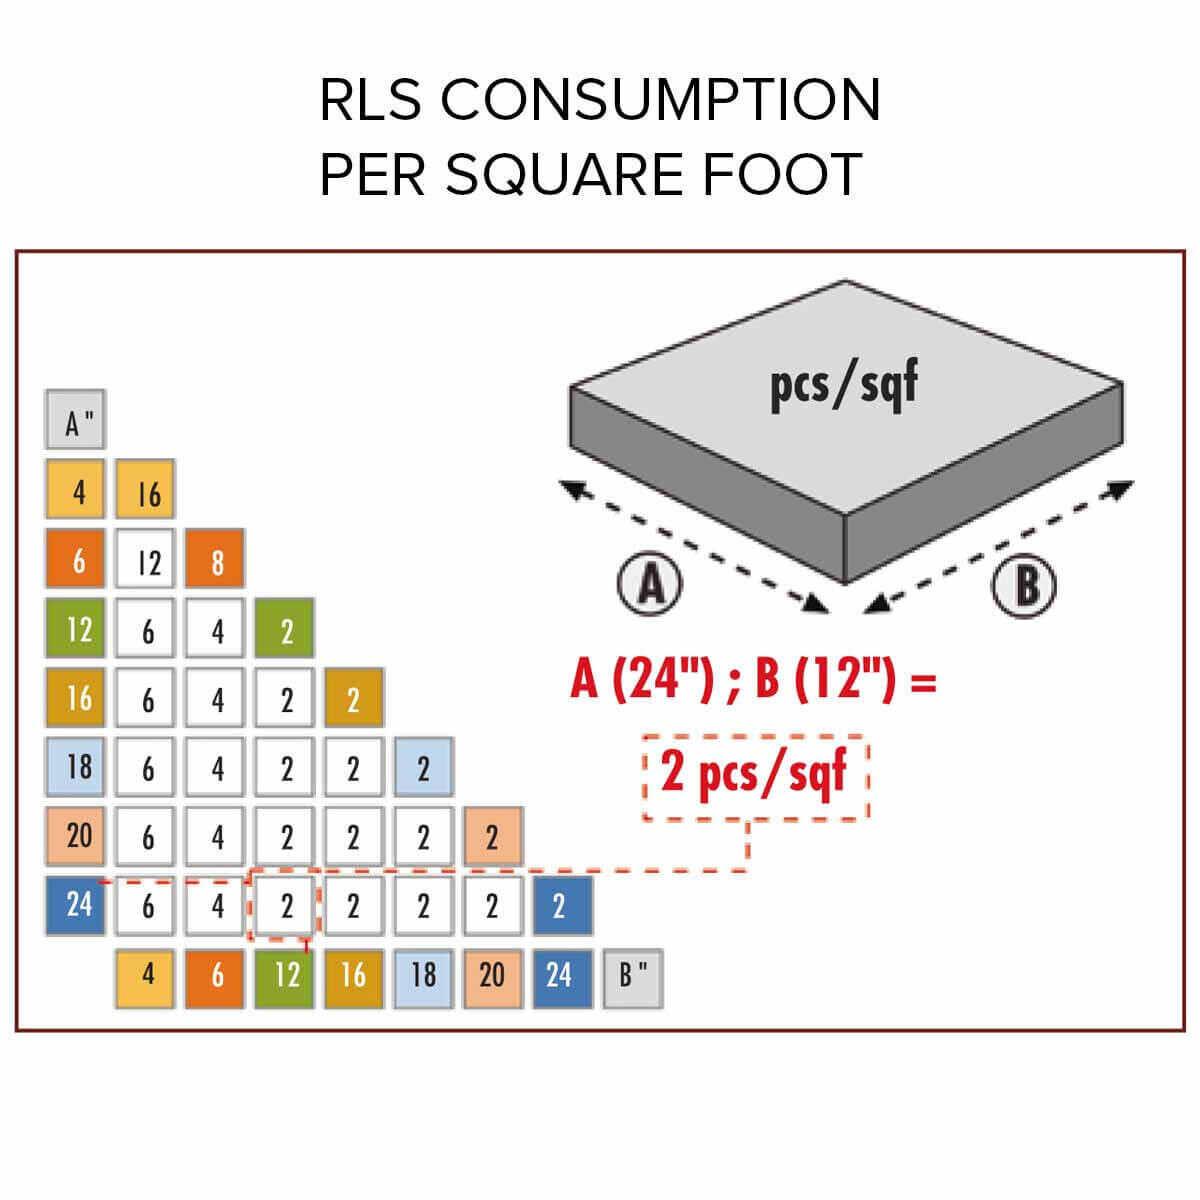 raimondi RLS clips and wedges leveling system consumption chart